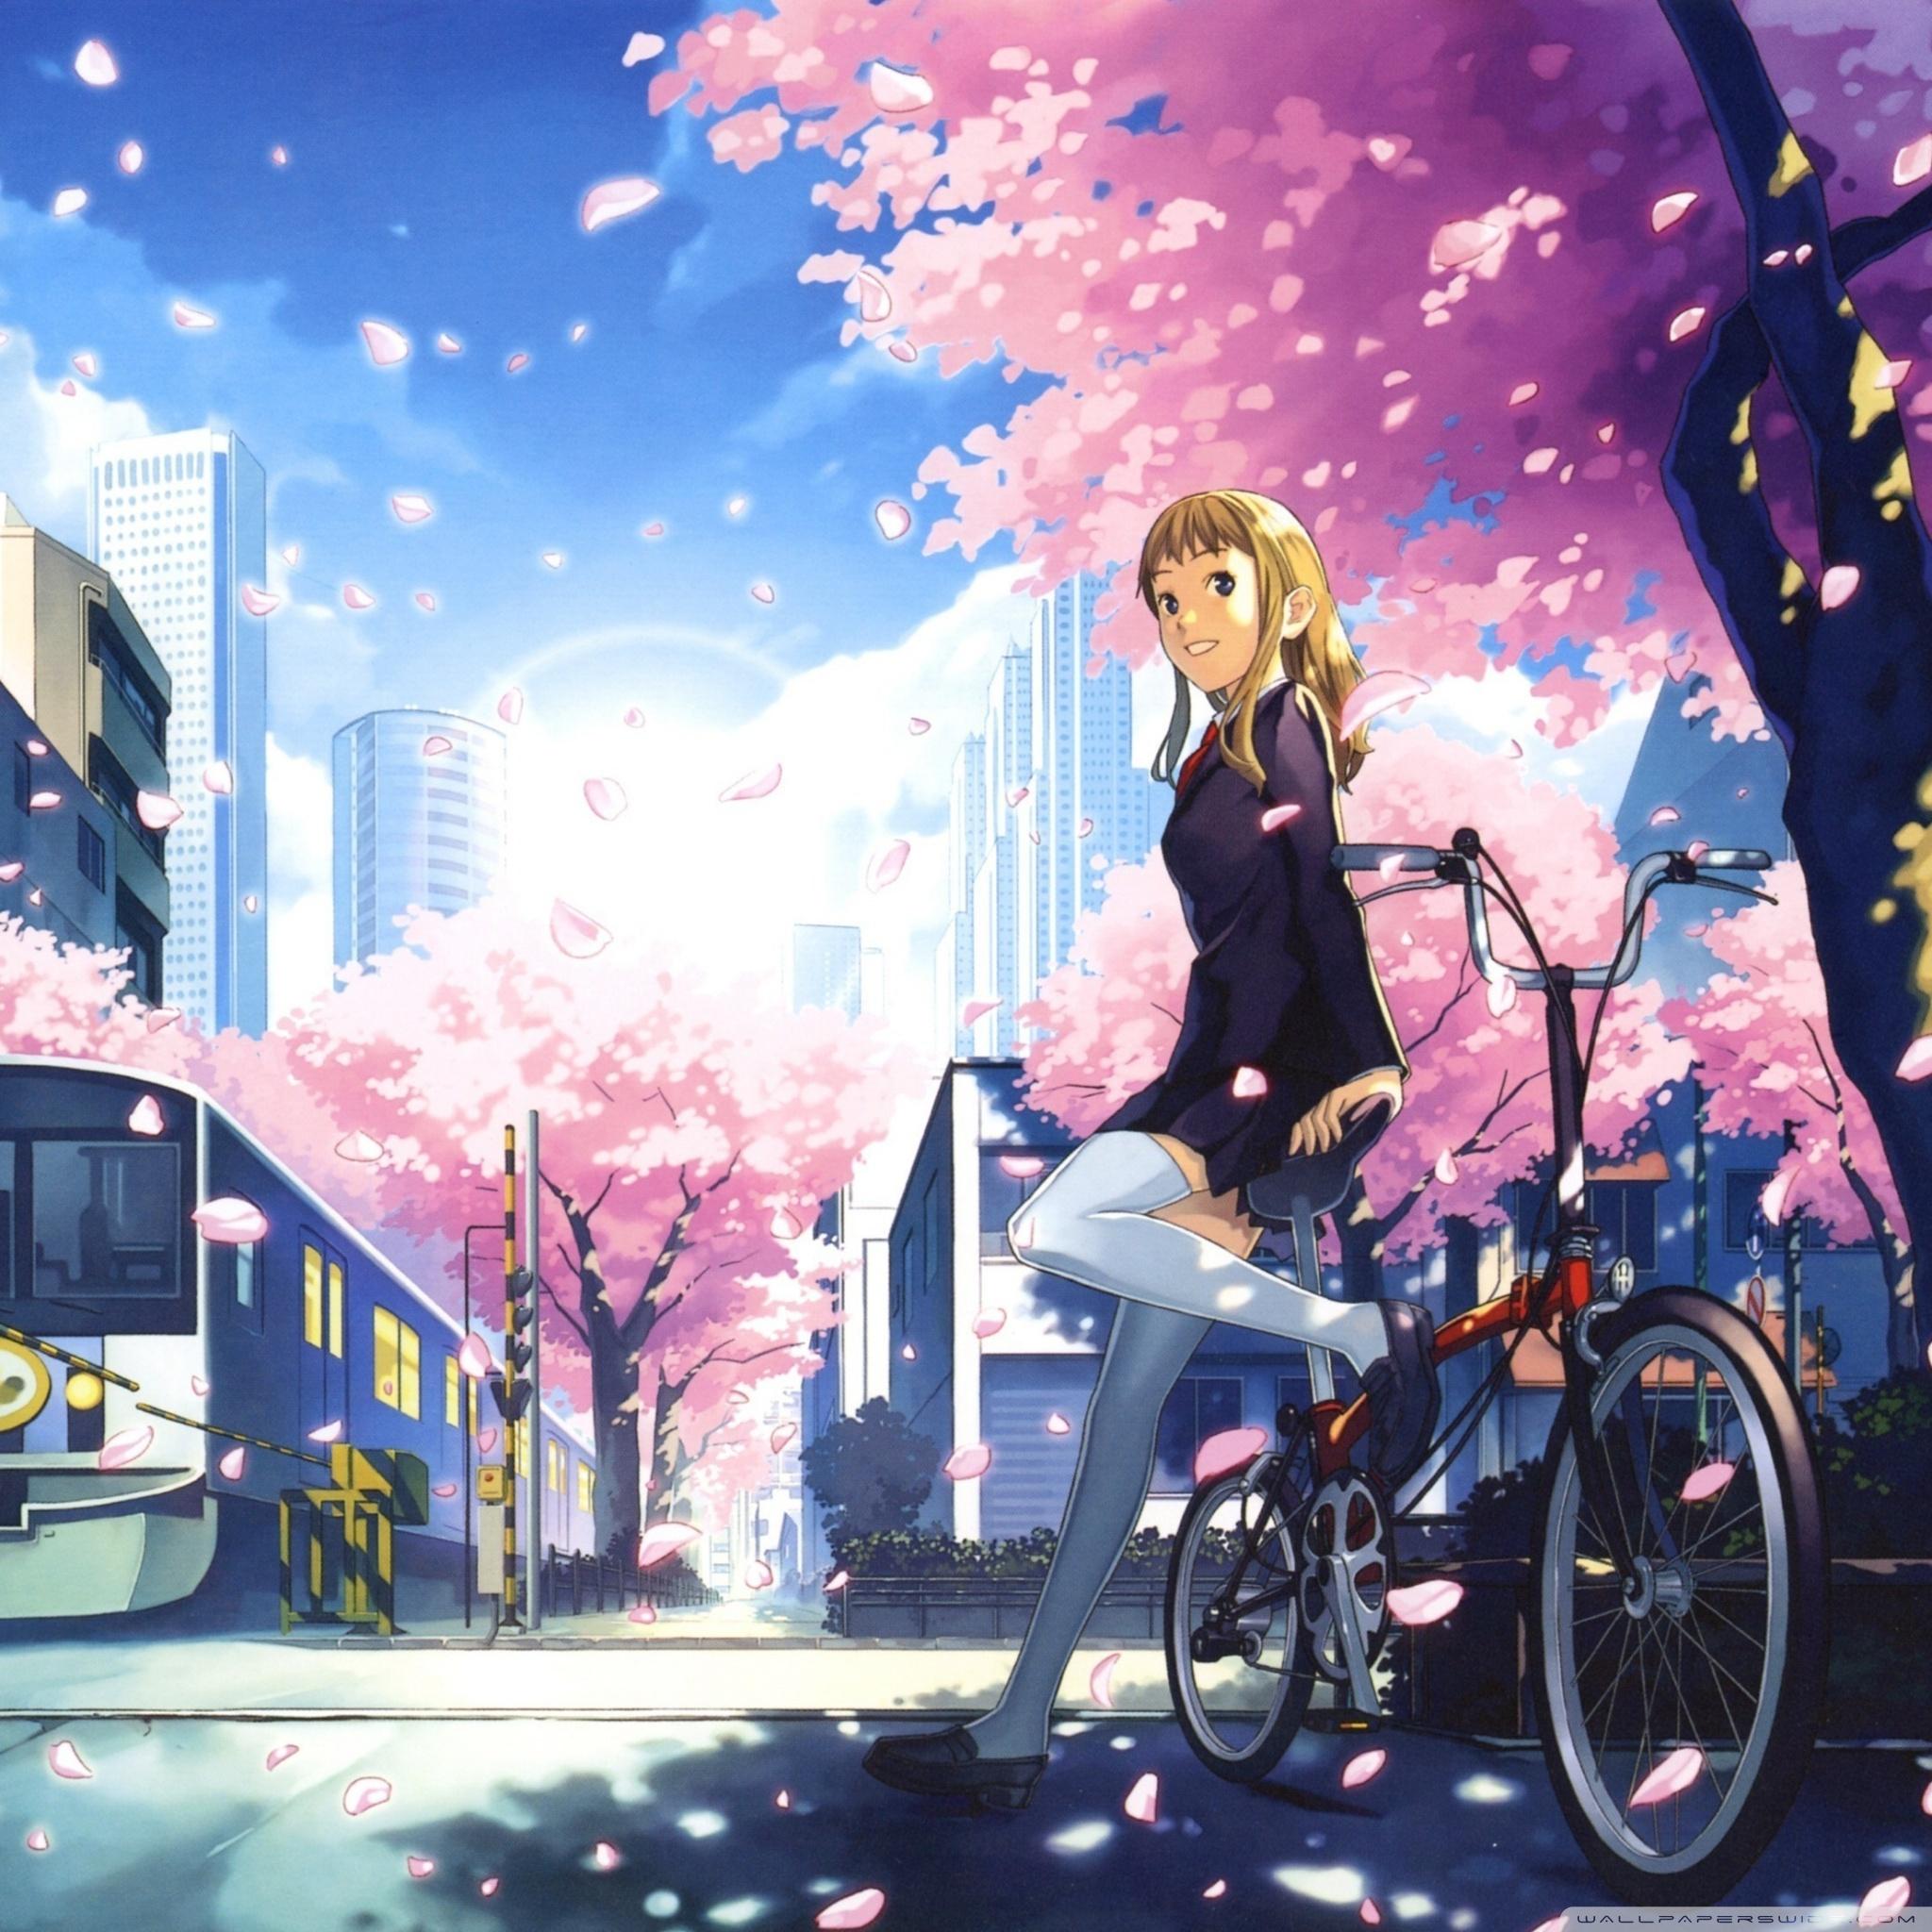 Anime Wallpaper Ipad Tapeten Anime 2048x2048 Wallpapertip